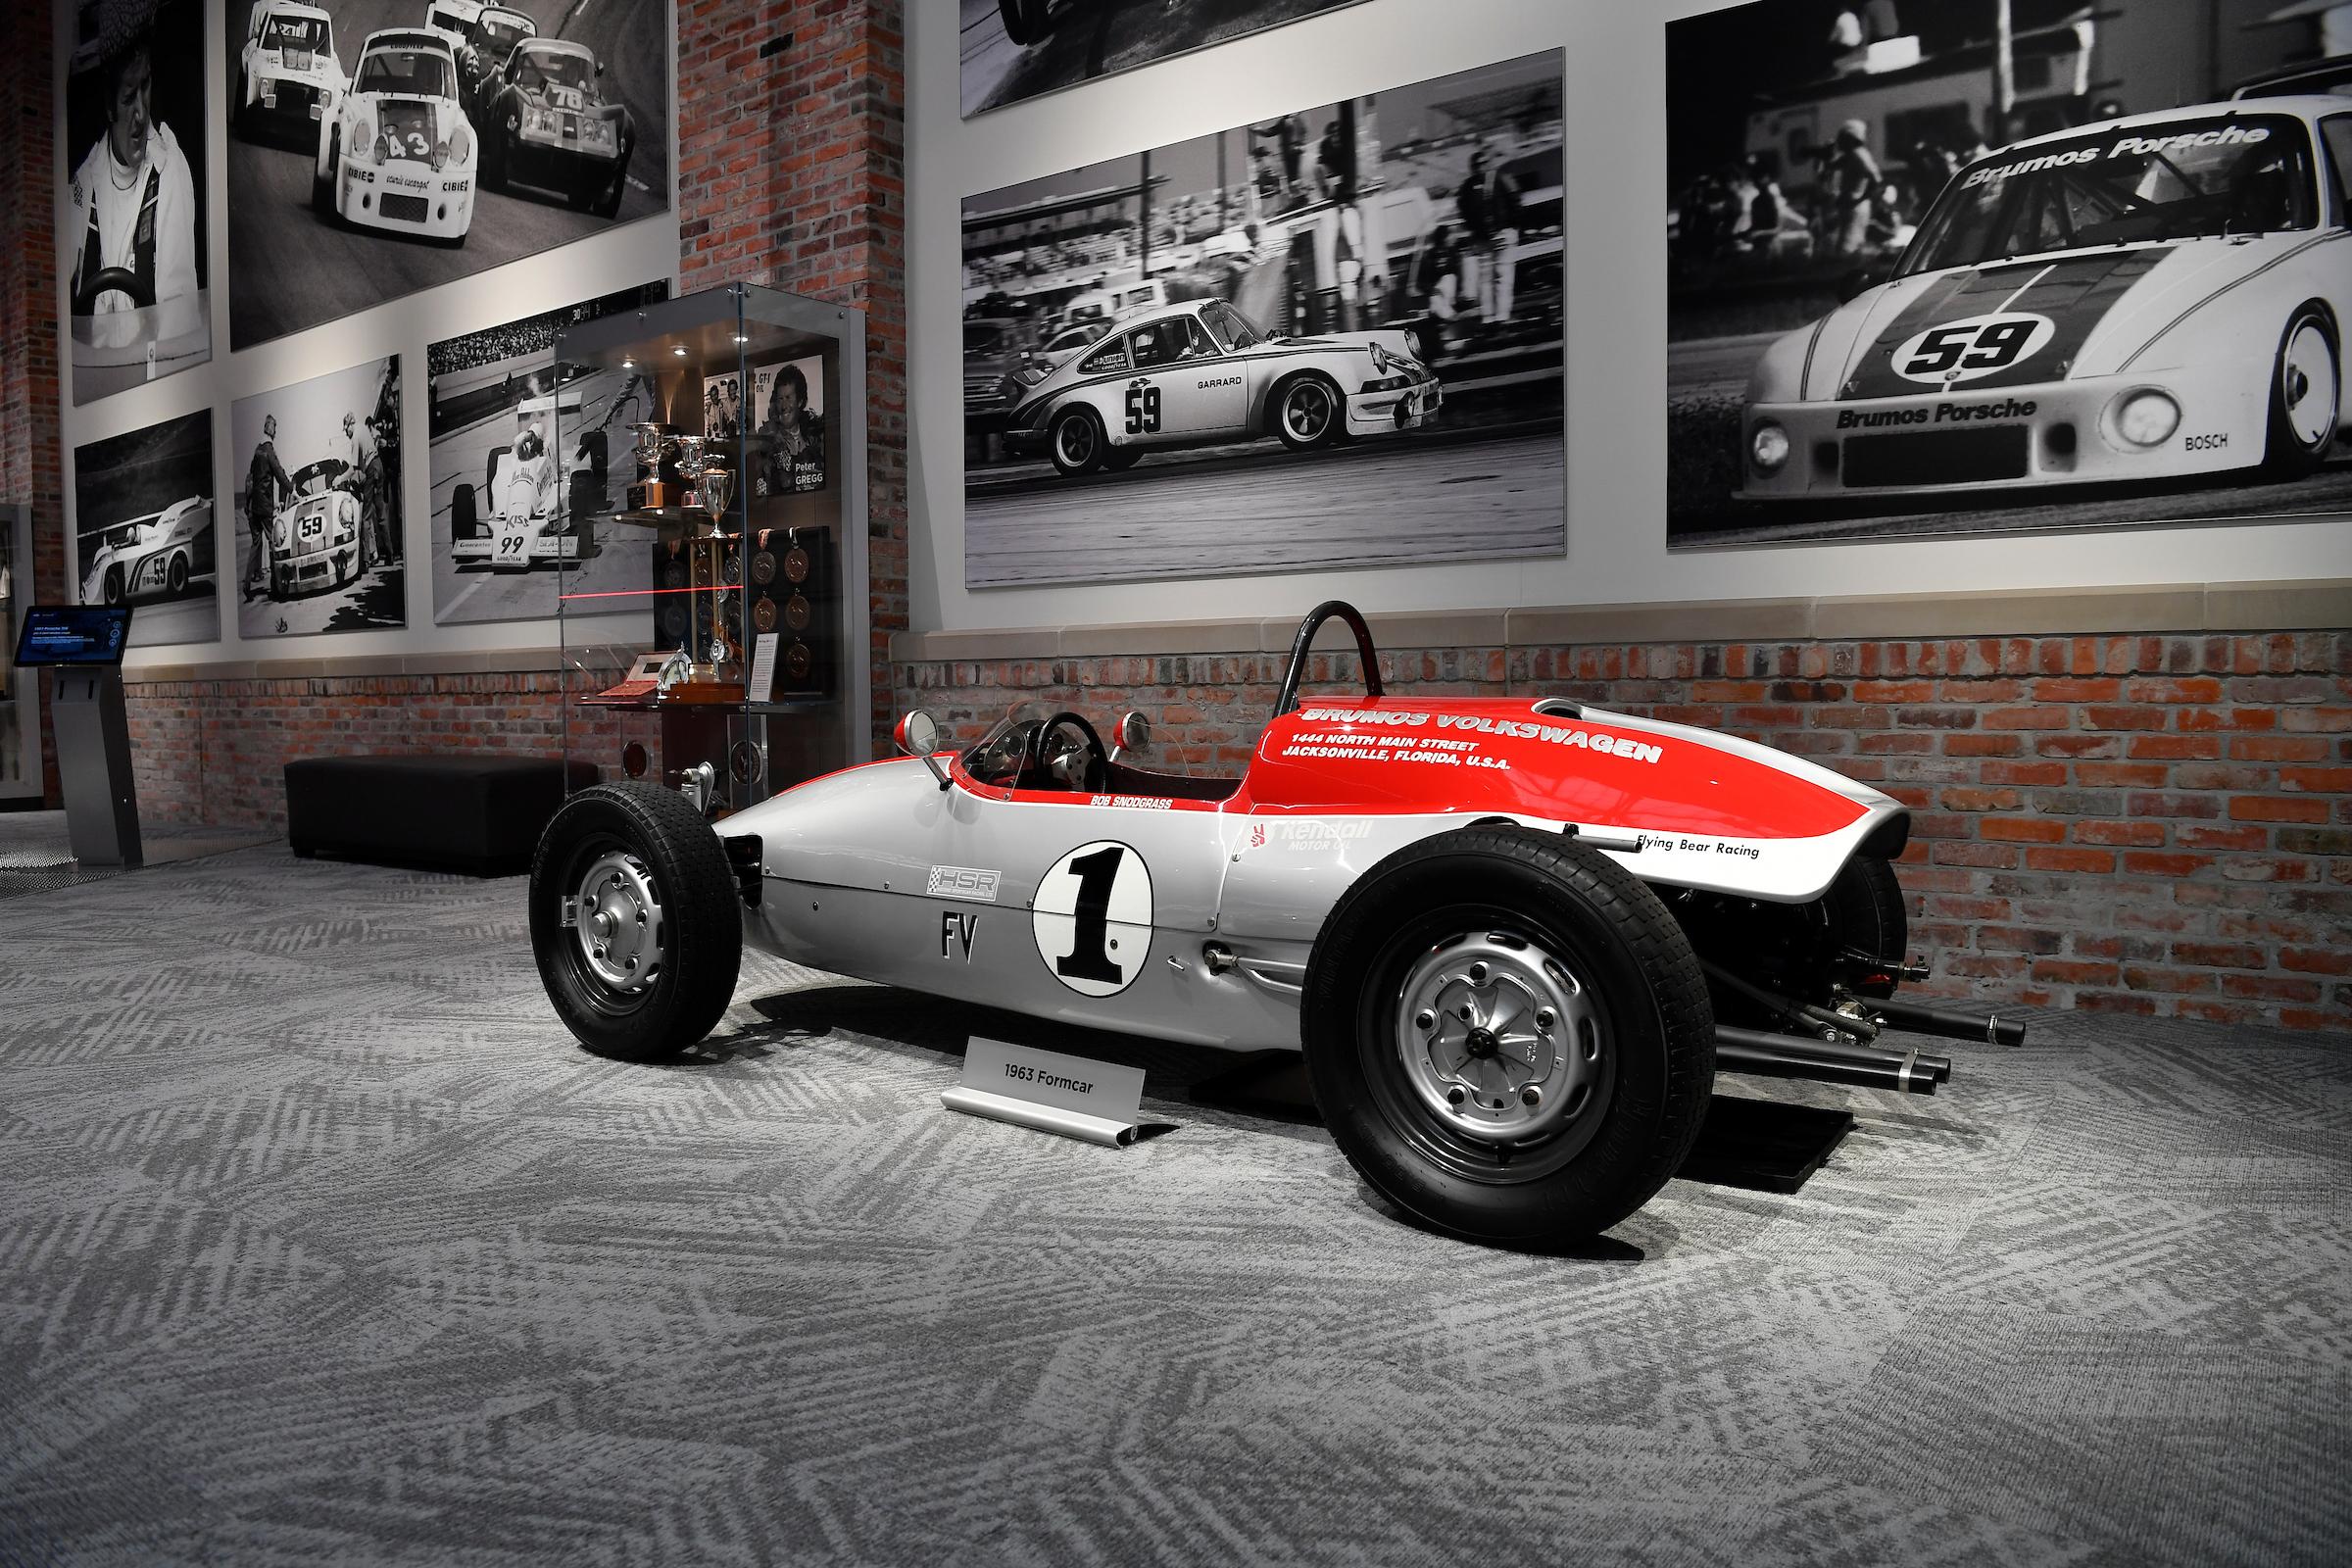 Brumos Collection 1963 Formcar